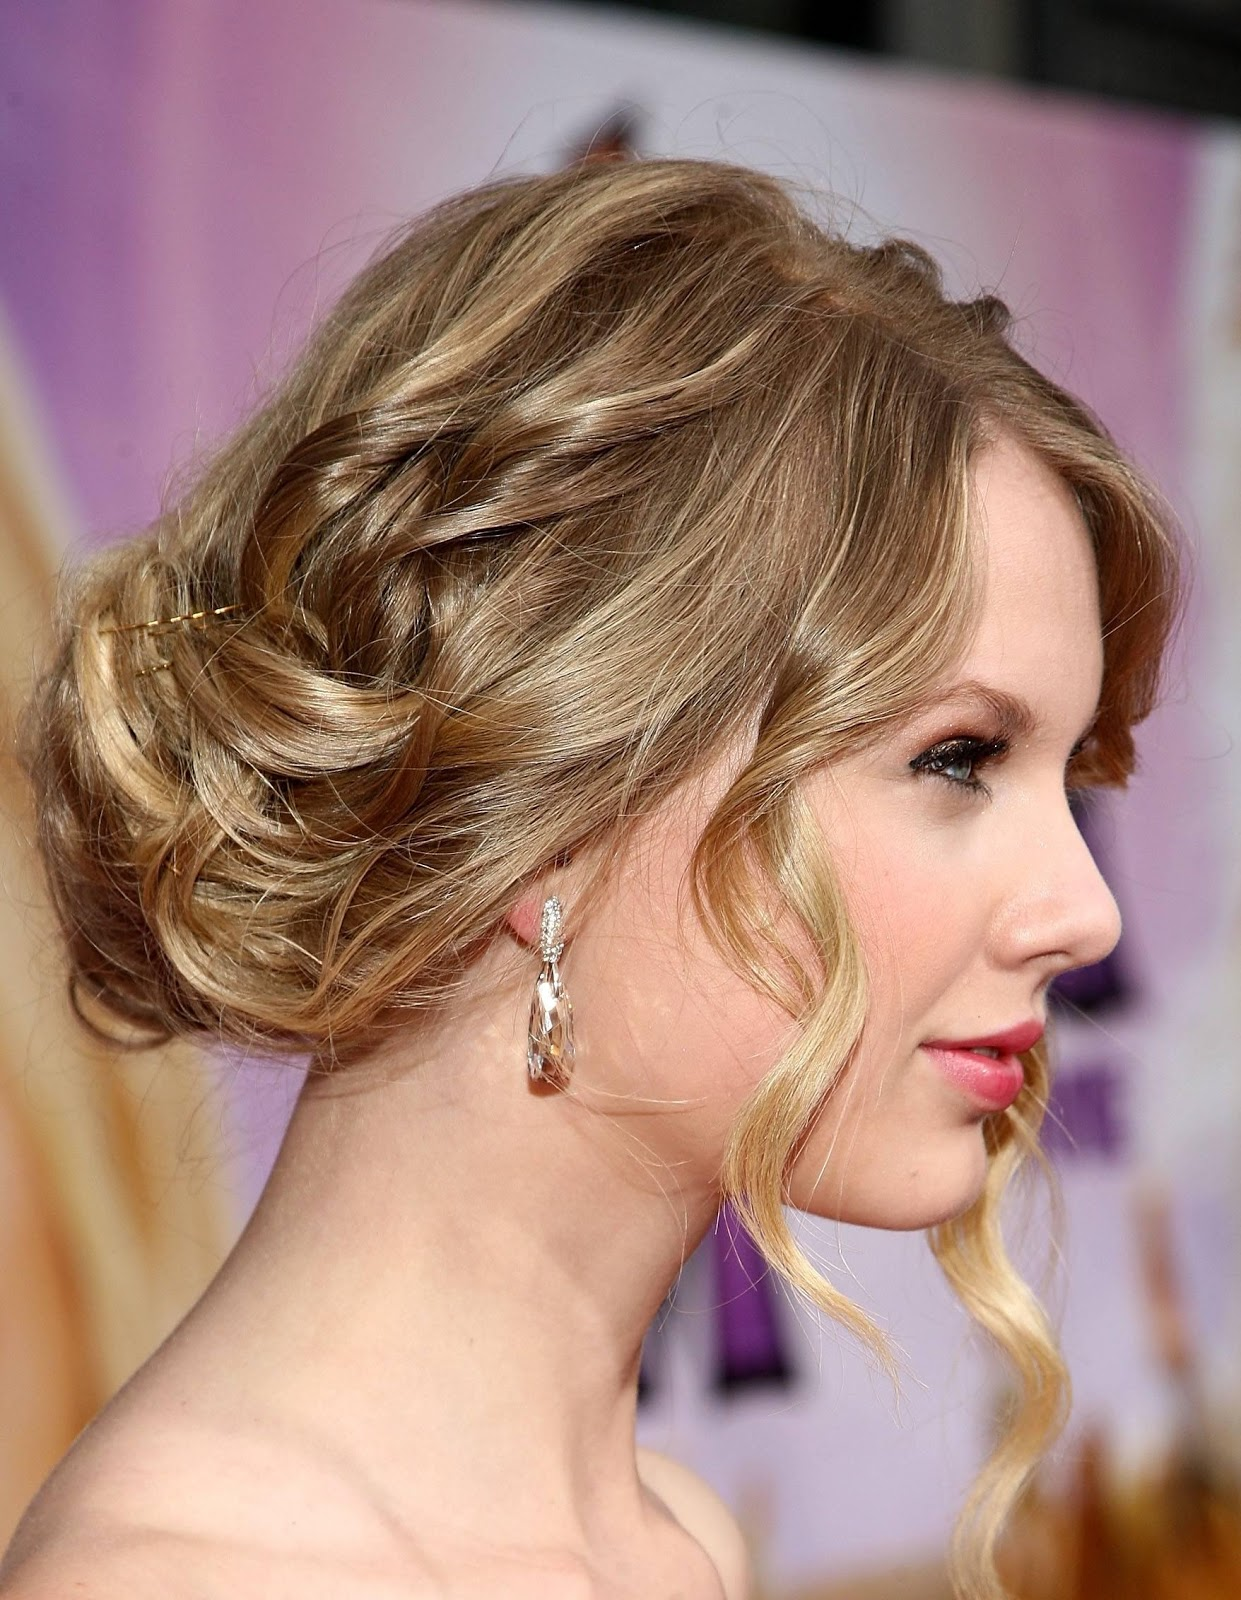 Elegance Hairstyle